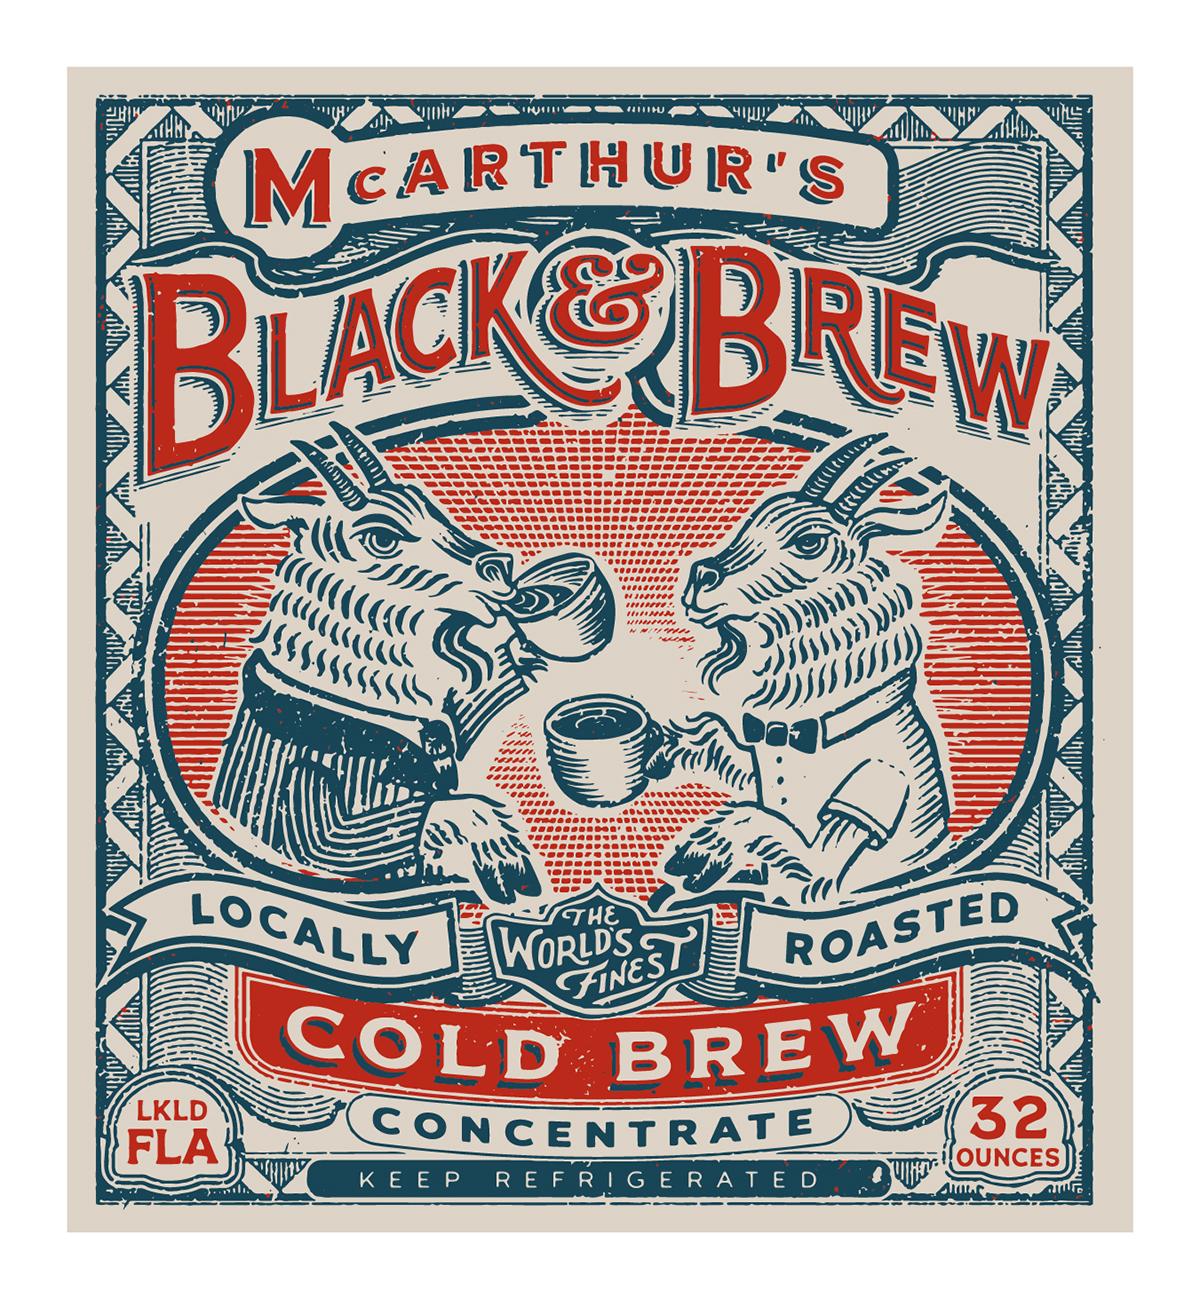 Coffee Cold Brew vintage goats BLACK AND BREW florida Label design Conrad Garner